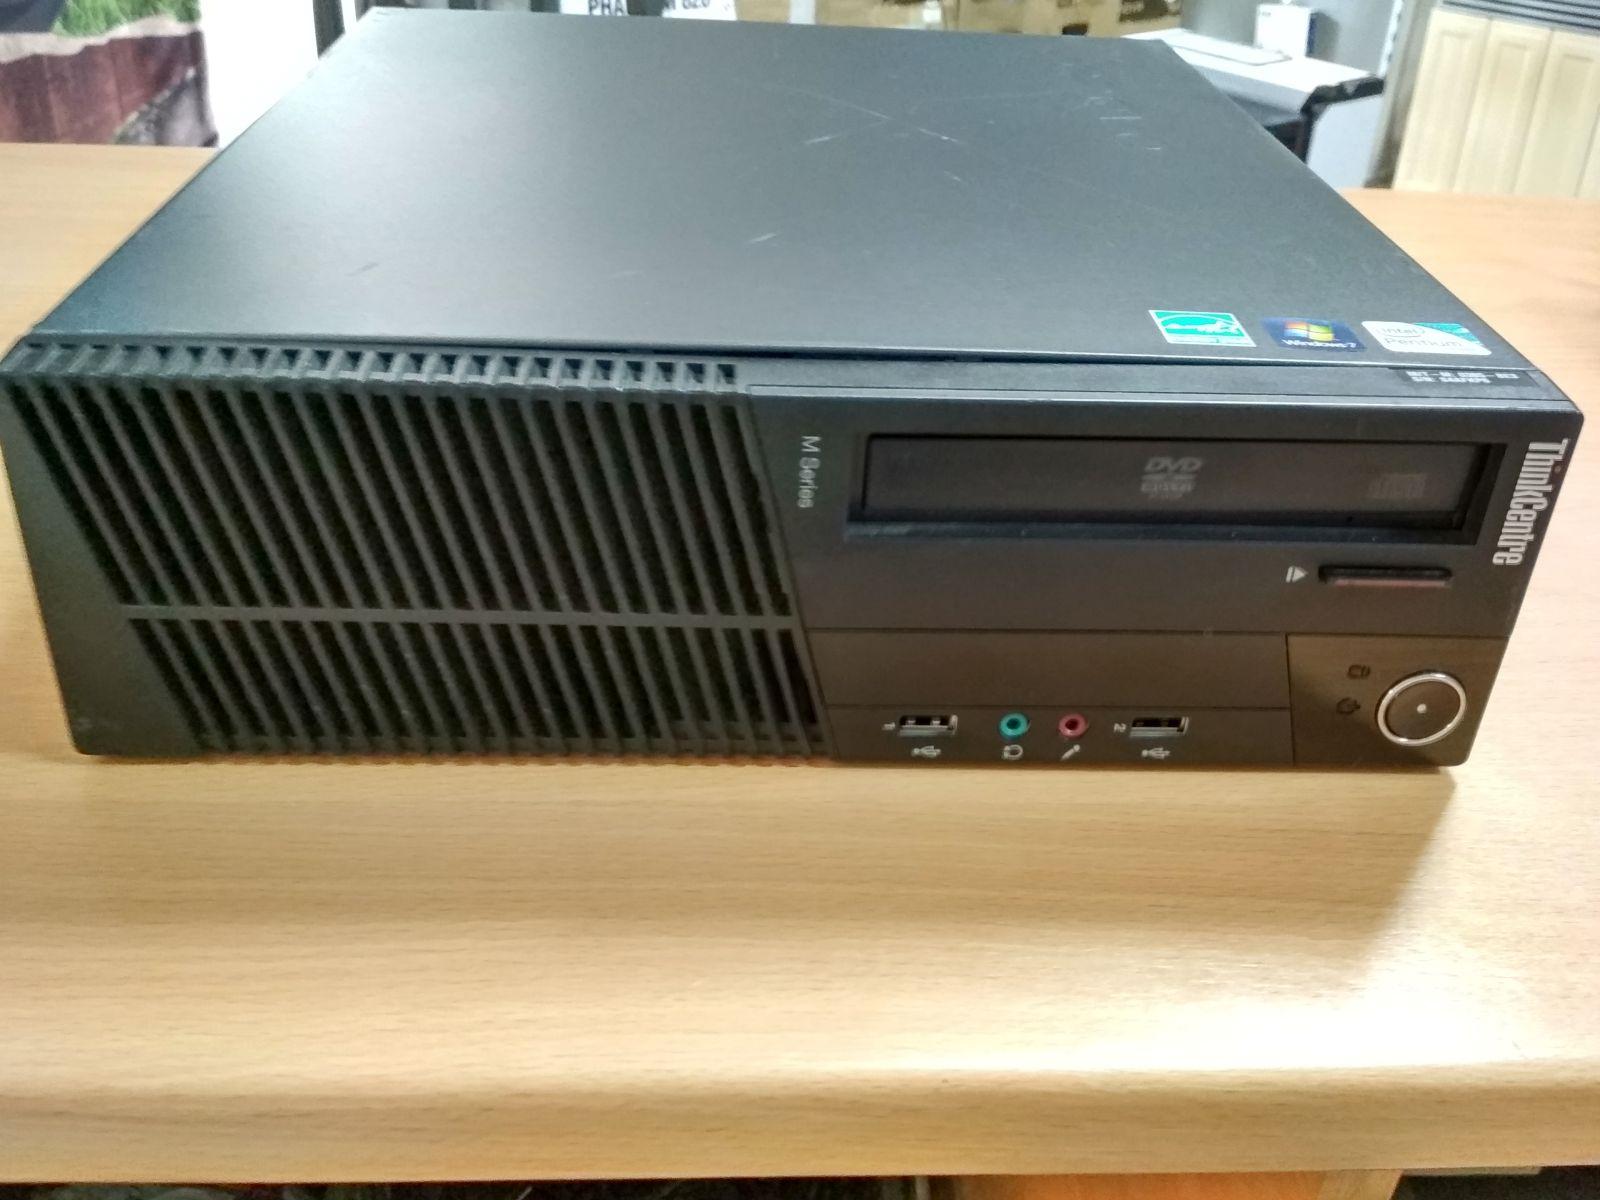 Lenovo ThinkCentre M81 SFF (0385) G620 / 4GB / 250 GB használt 3 hó gar!